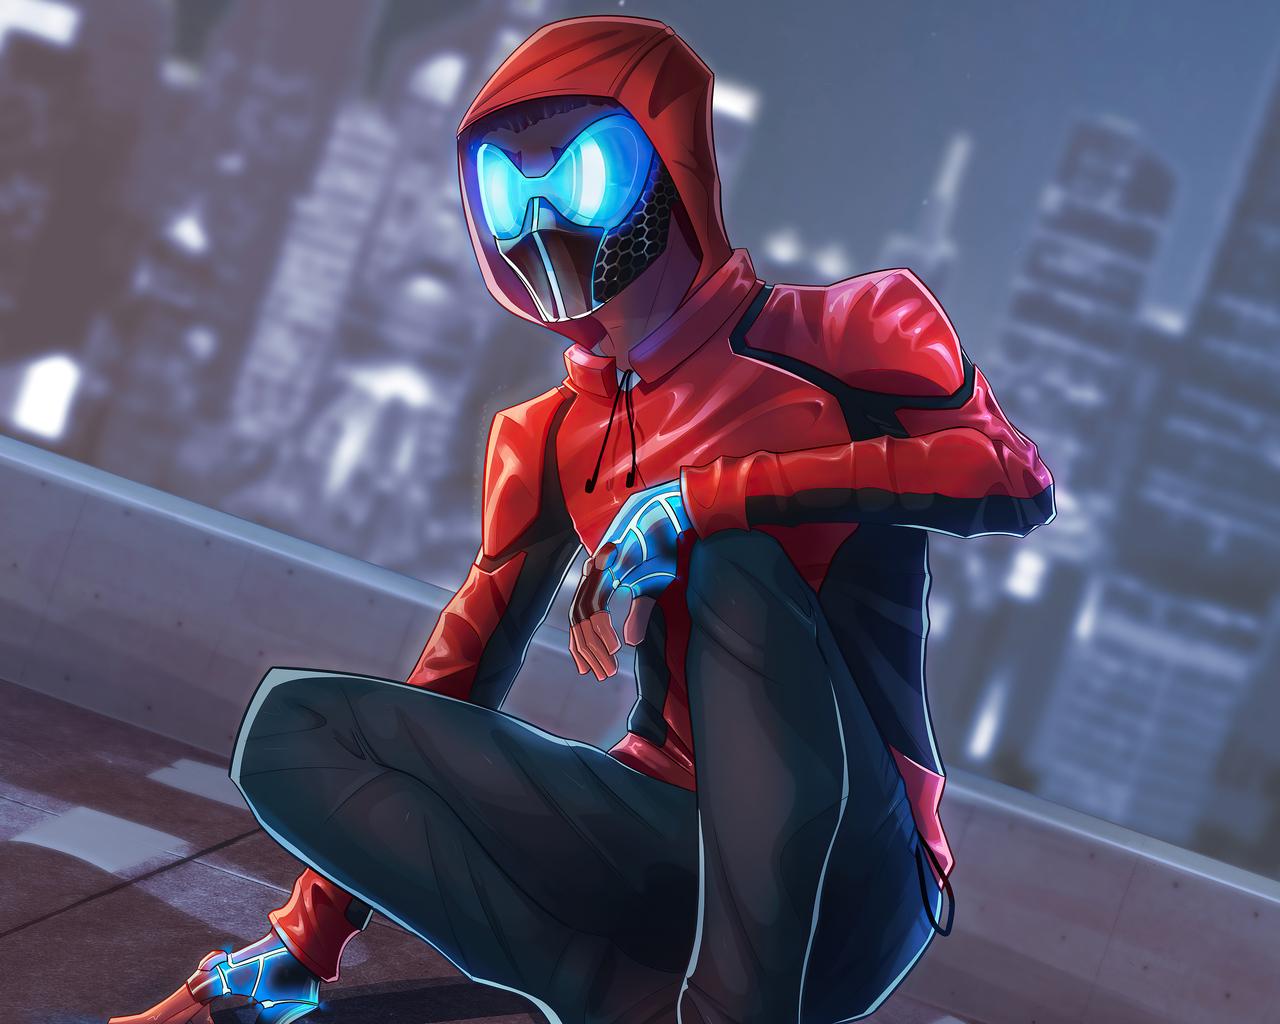 spiderman-night-mask-5k-b8.jpg